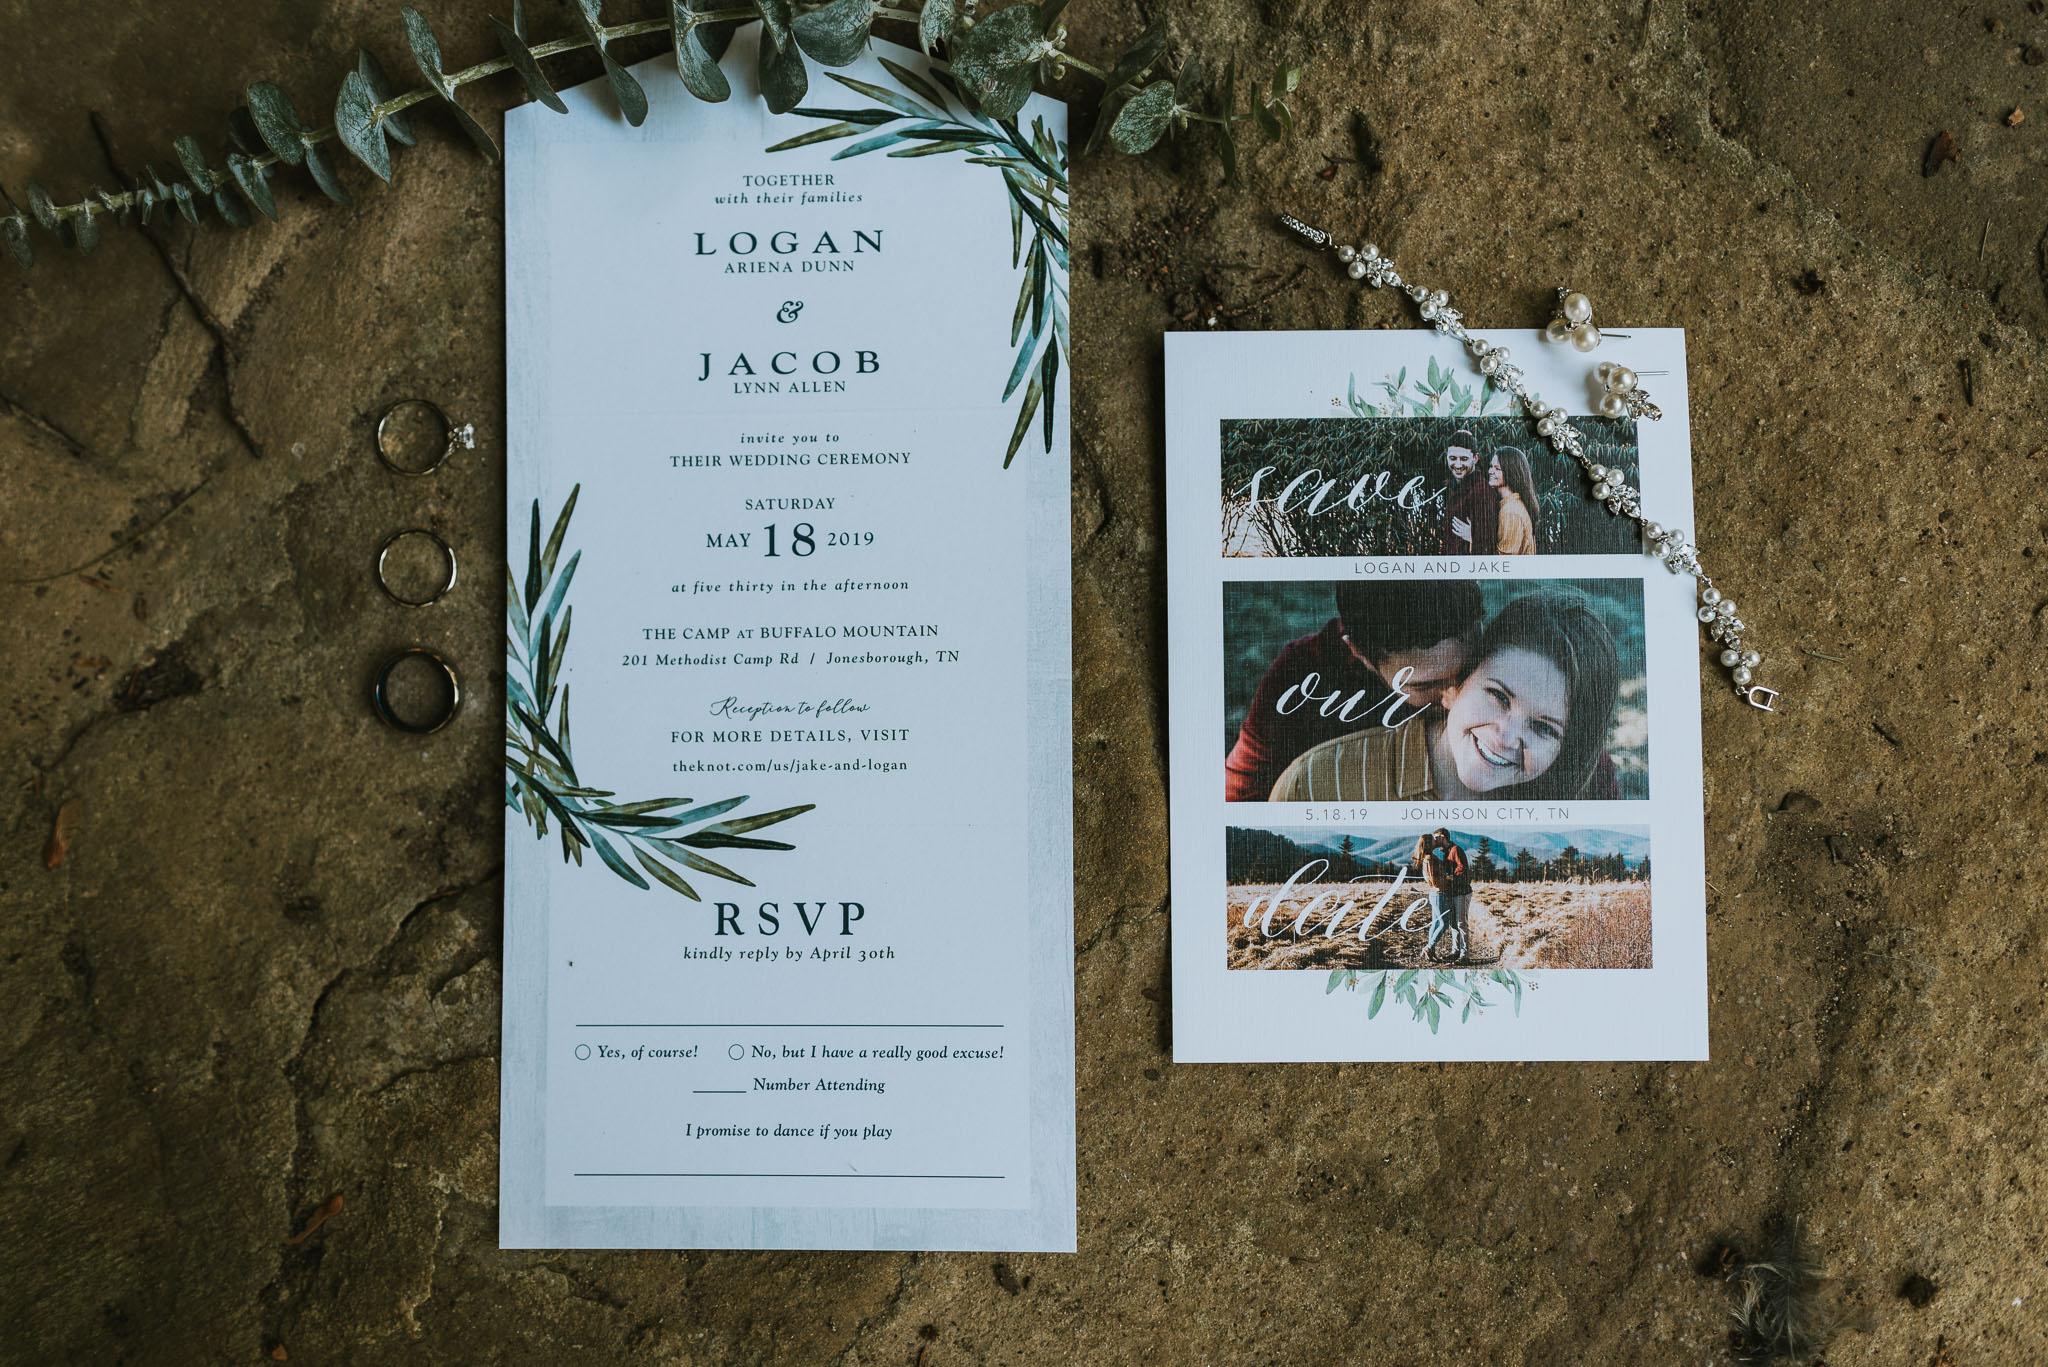 The Camp at Buffalo Mountain Wedding, Johnson City, TN, Northeast TN Wedding Photographer, East Tennessee Wedding Photographer, Knoxville, TN Wedding Photographer